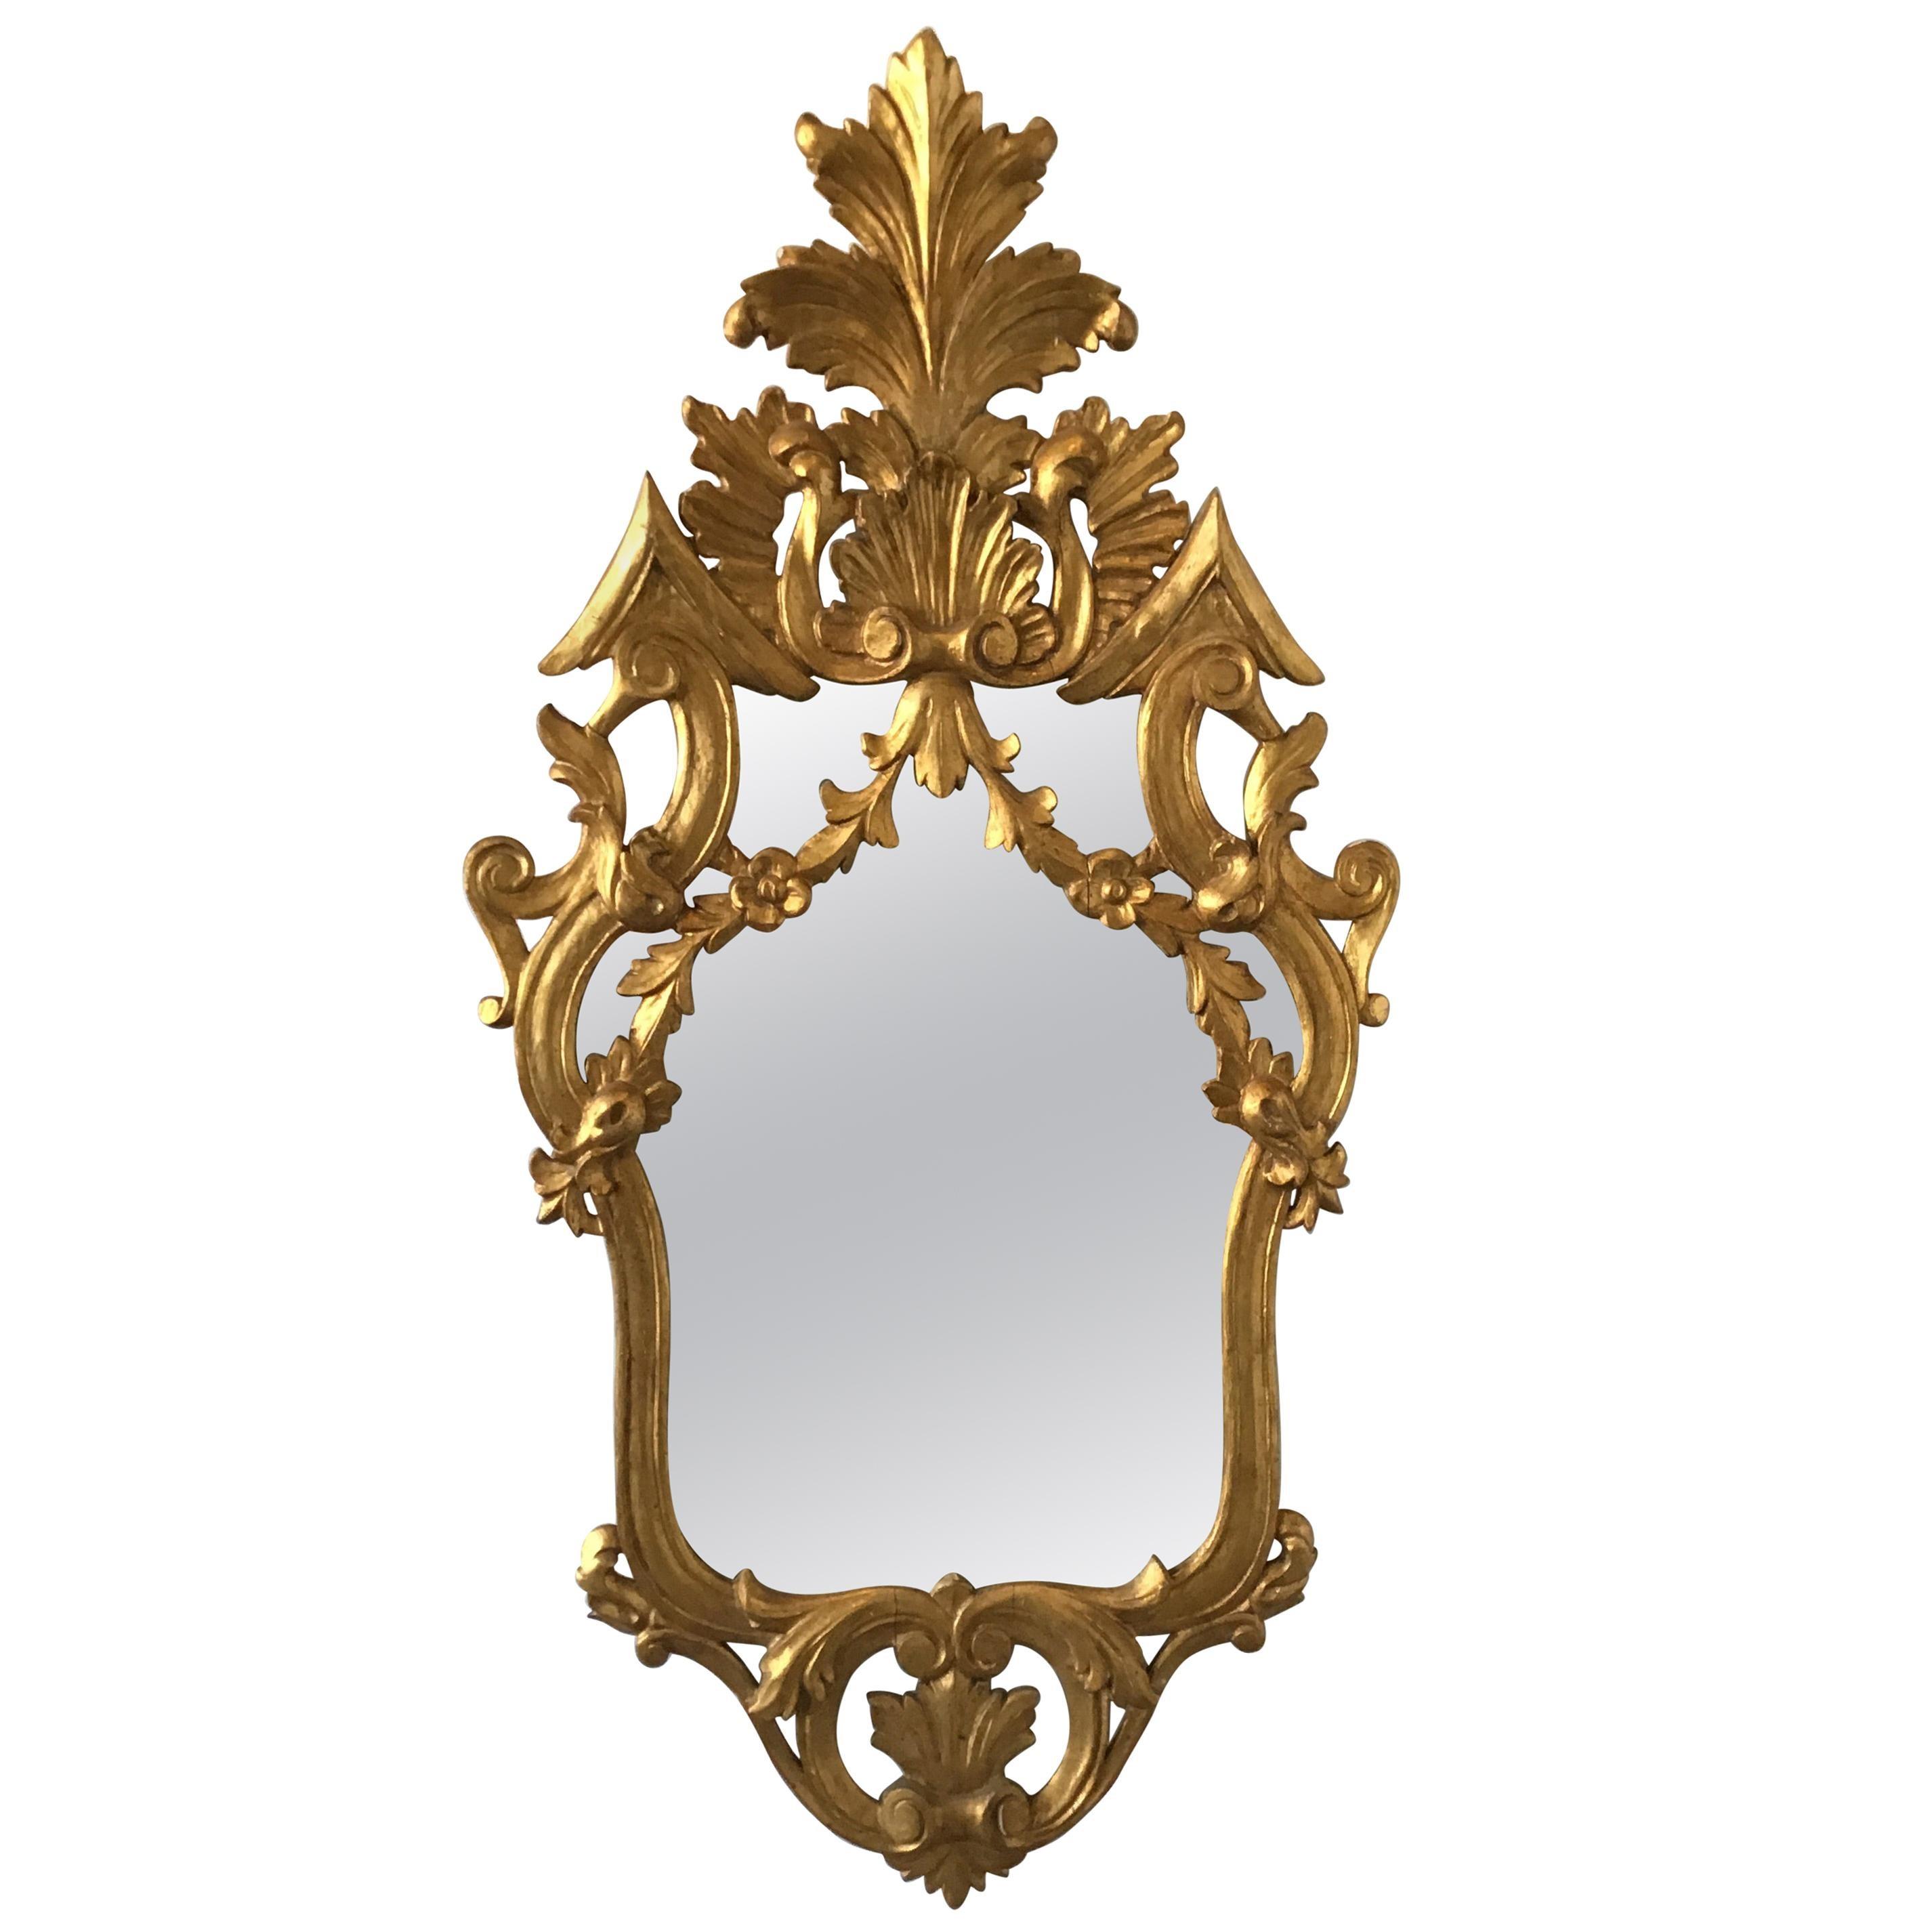 1950s Italian Gilt Carved Wood Mirror